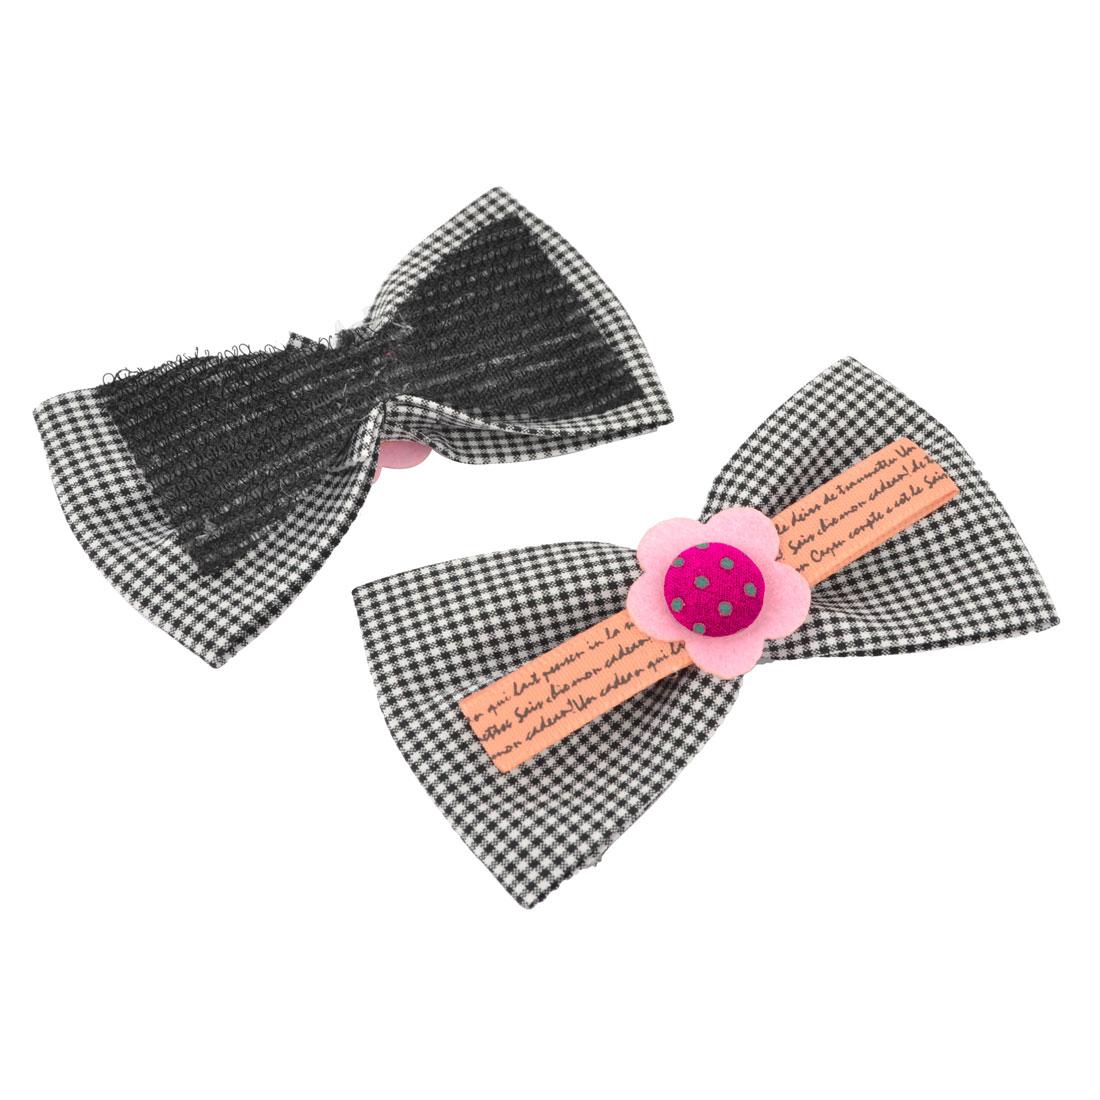 2 Pcs Flower Accent Black White Bowtie Hair Bangs Magic Sheets for Ladies